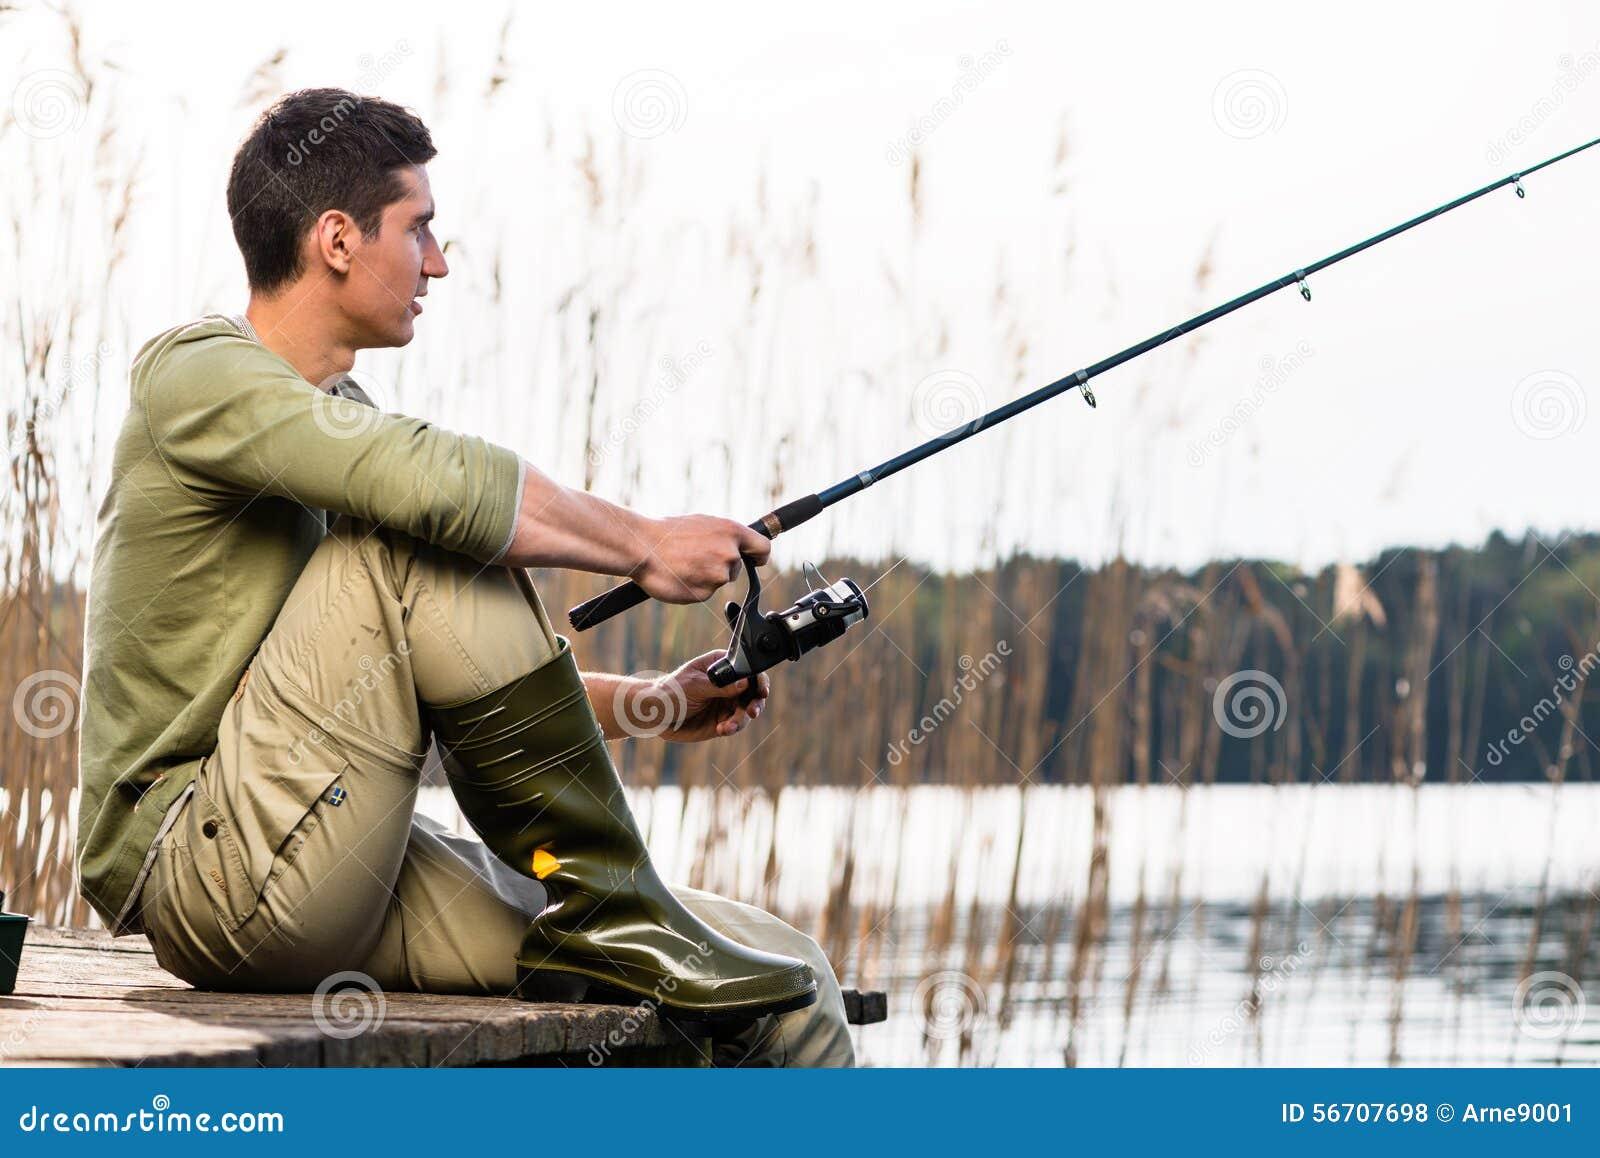 Man relaxing fishing or angling at lake